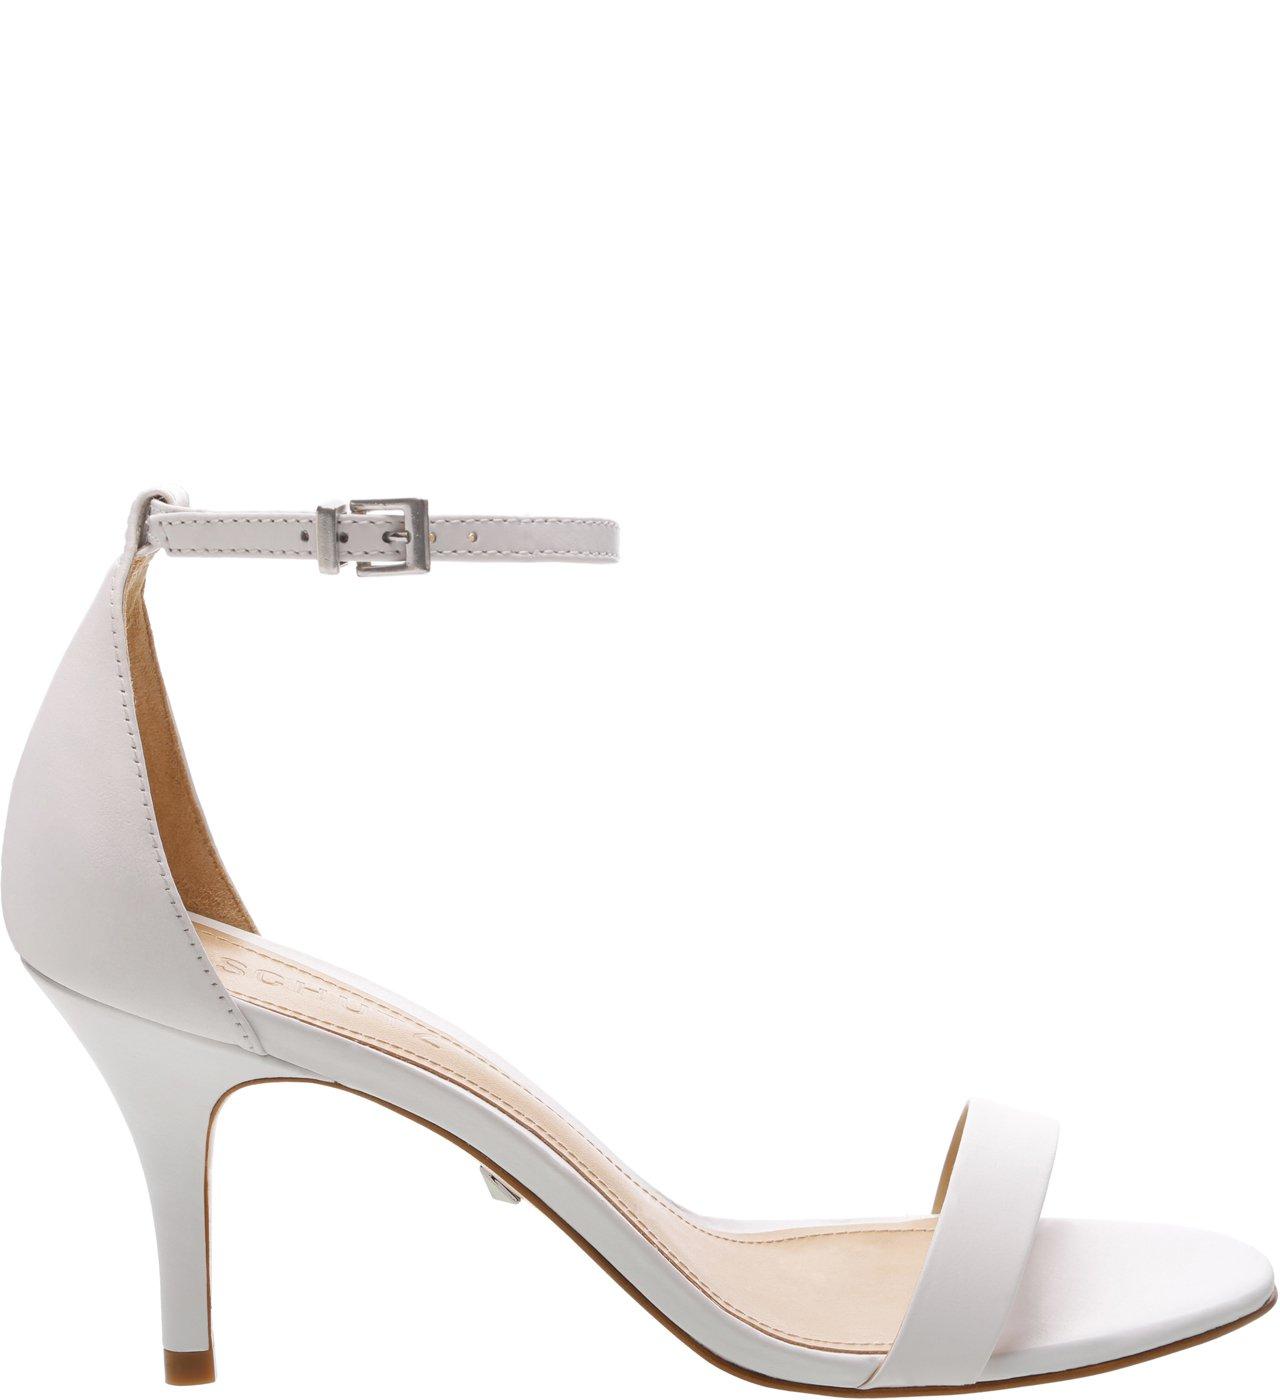 Sandália Gisele Kitten Heel White | Schutz